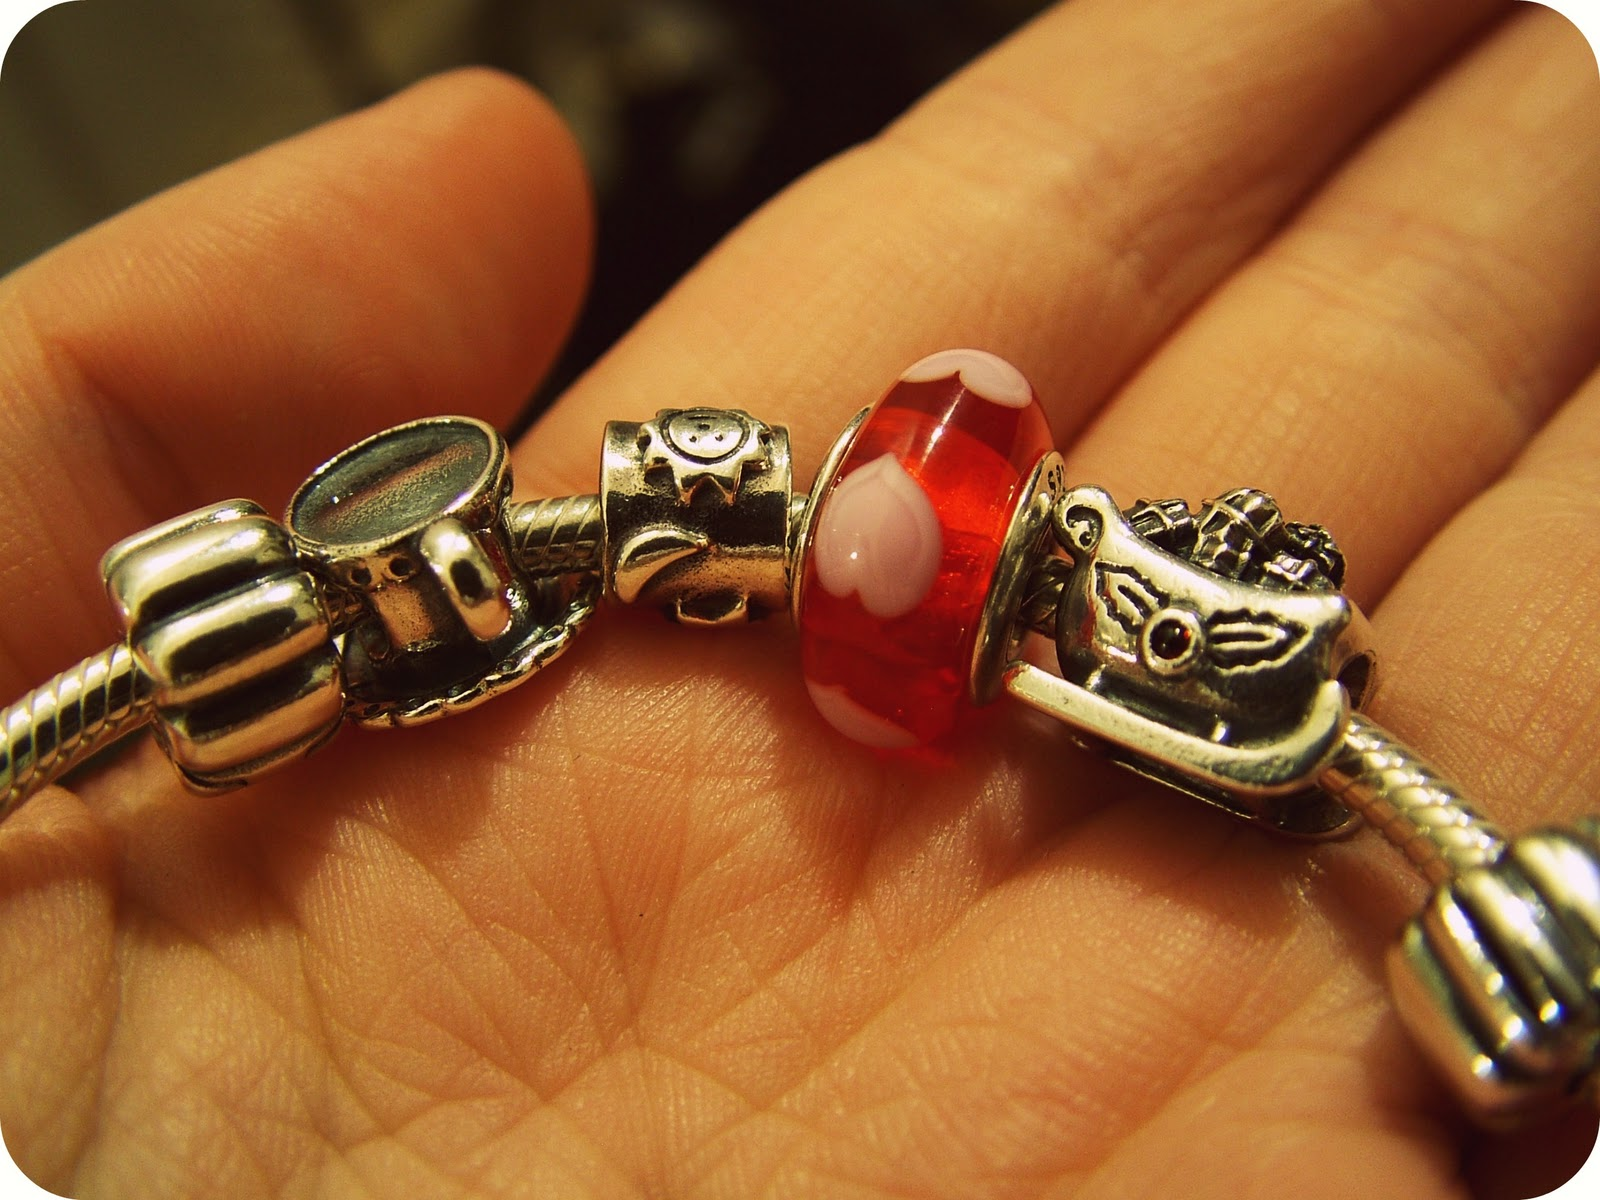 bracelet on wrist - photo #24